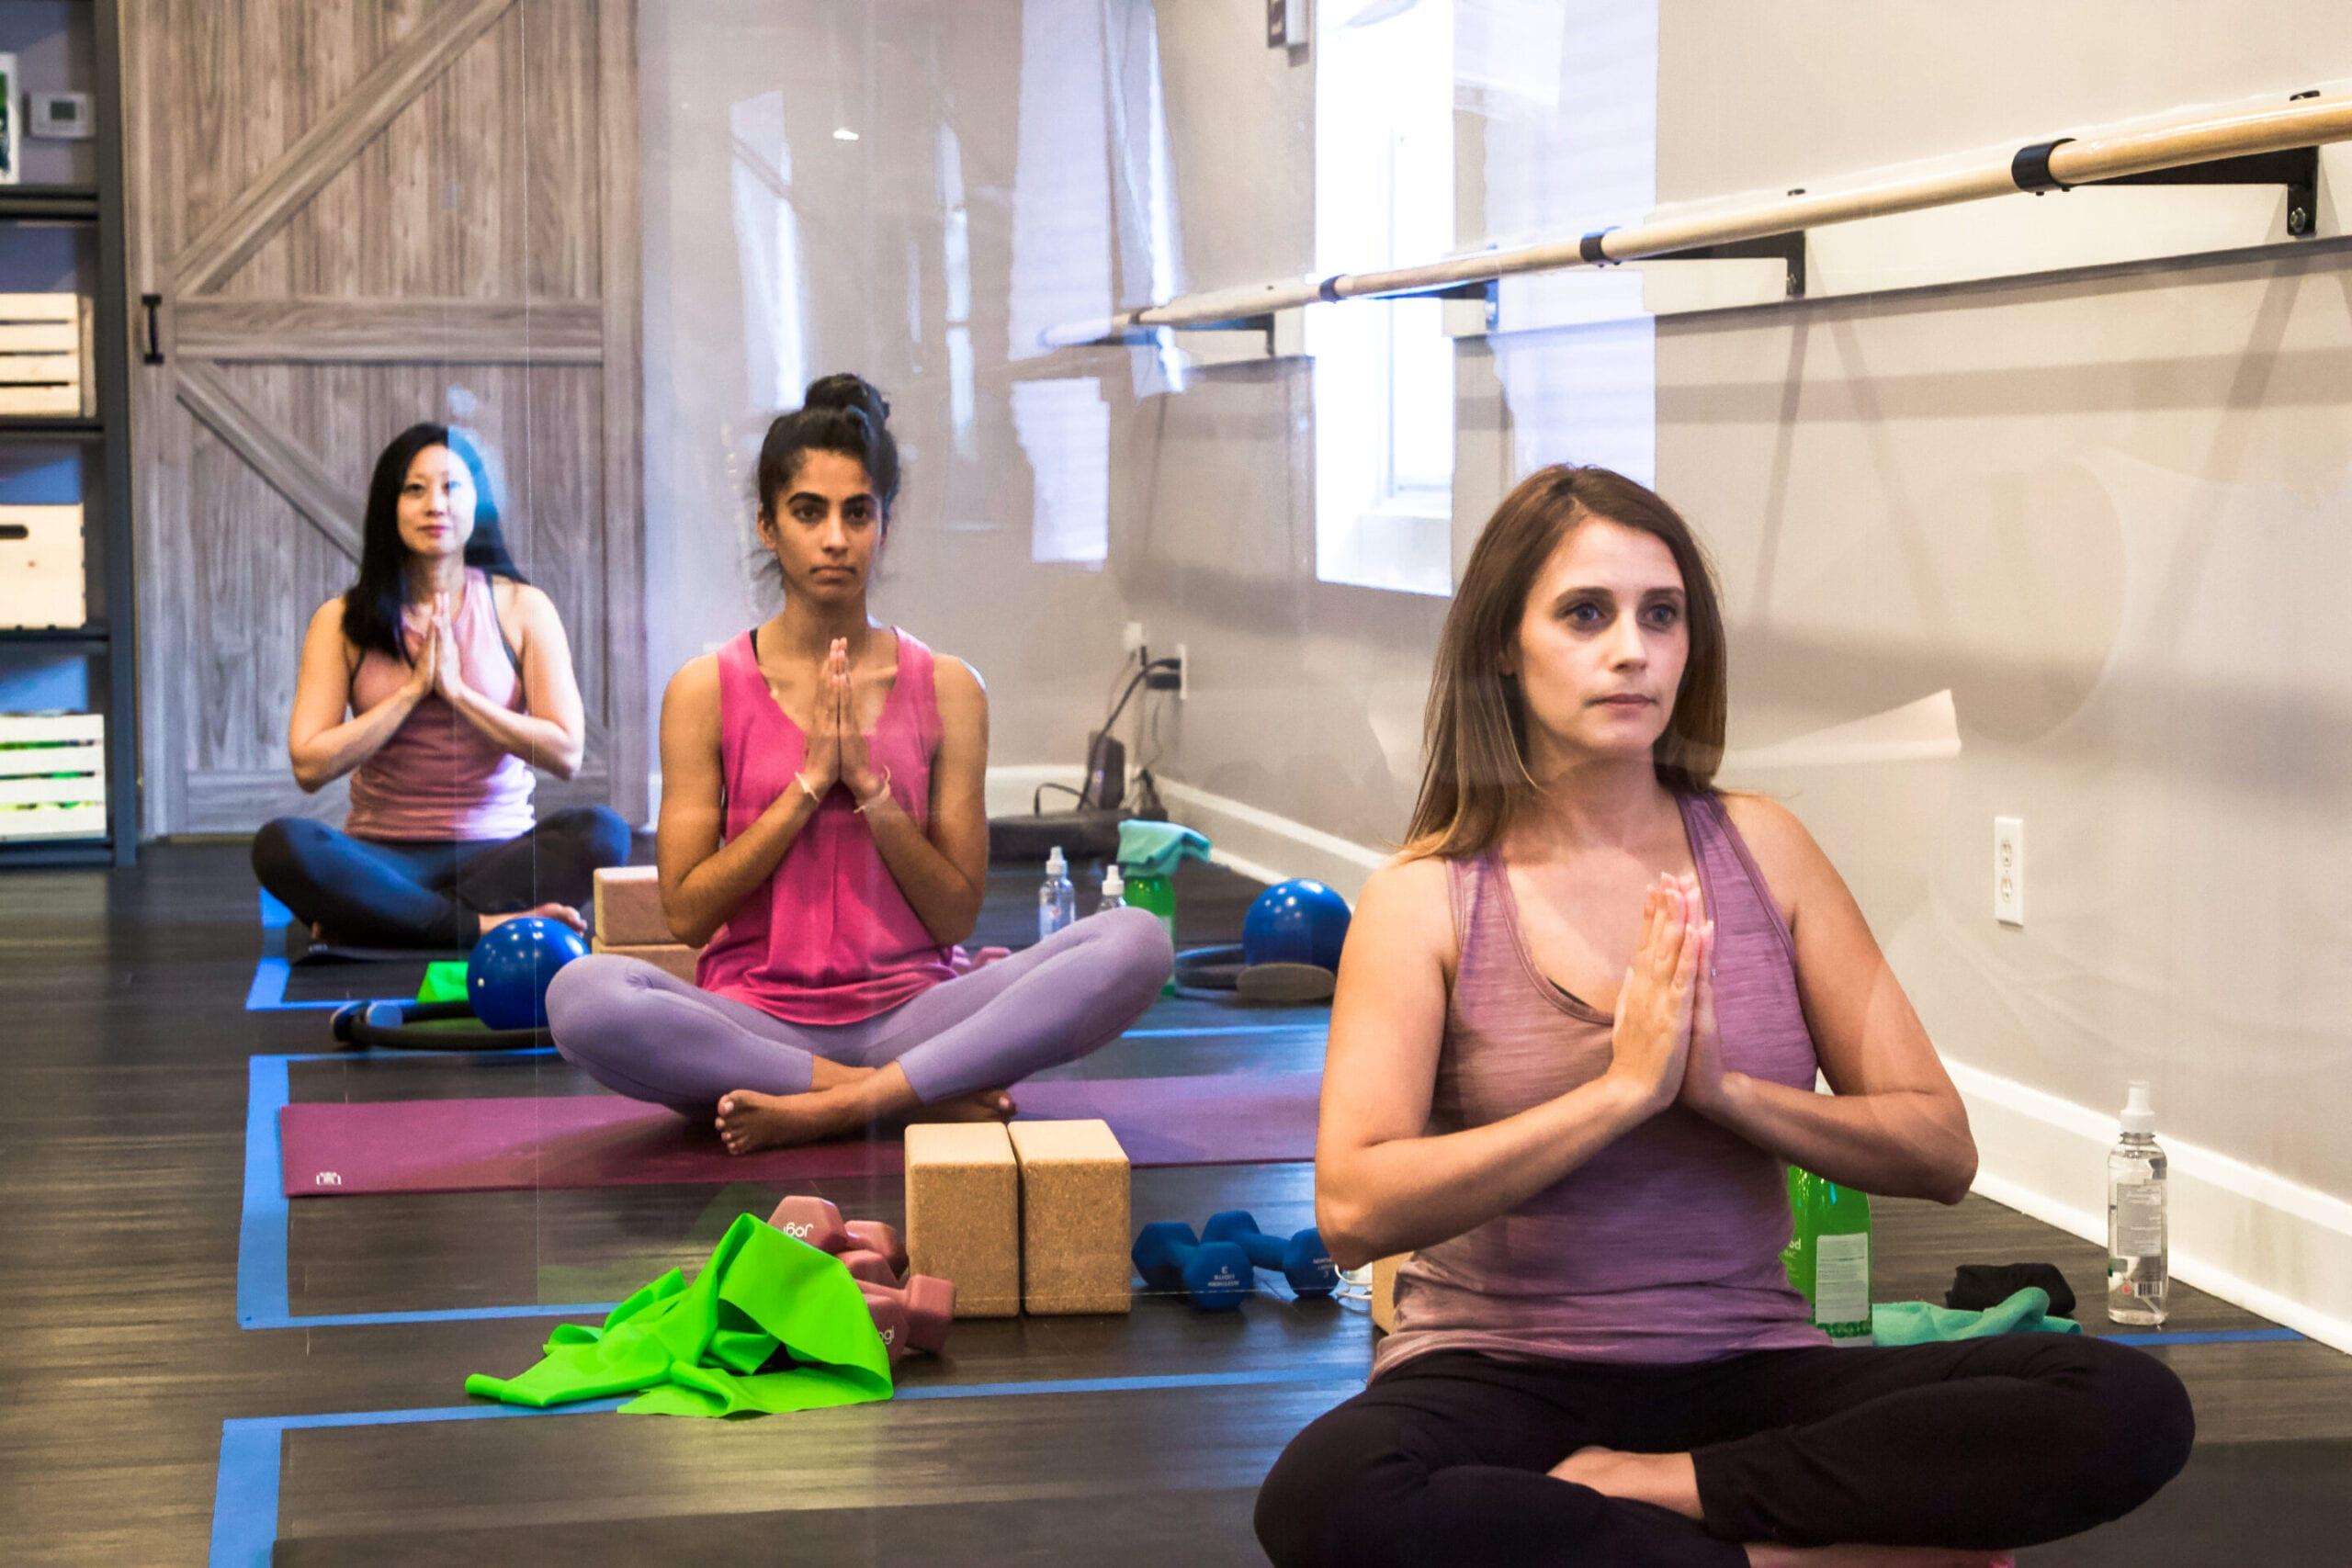 Chill yoga class groove barre